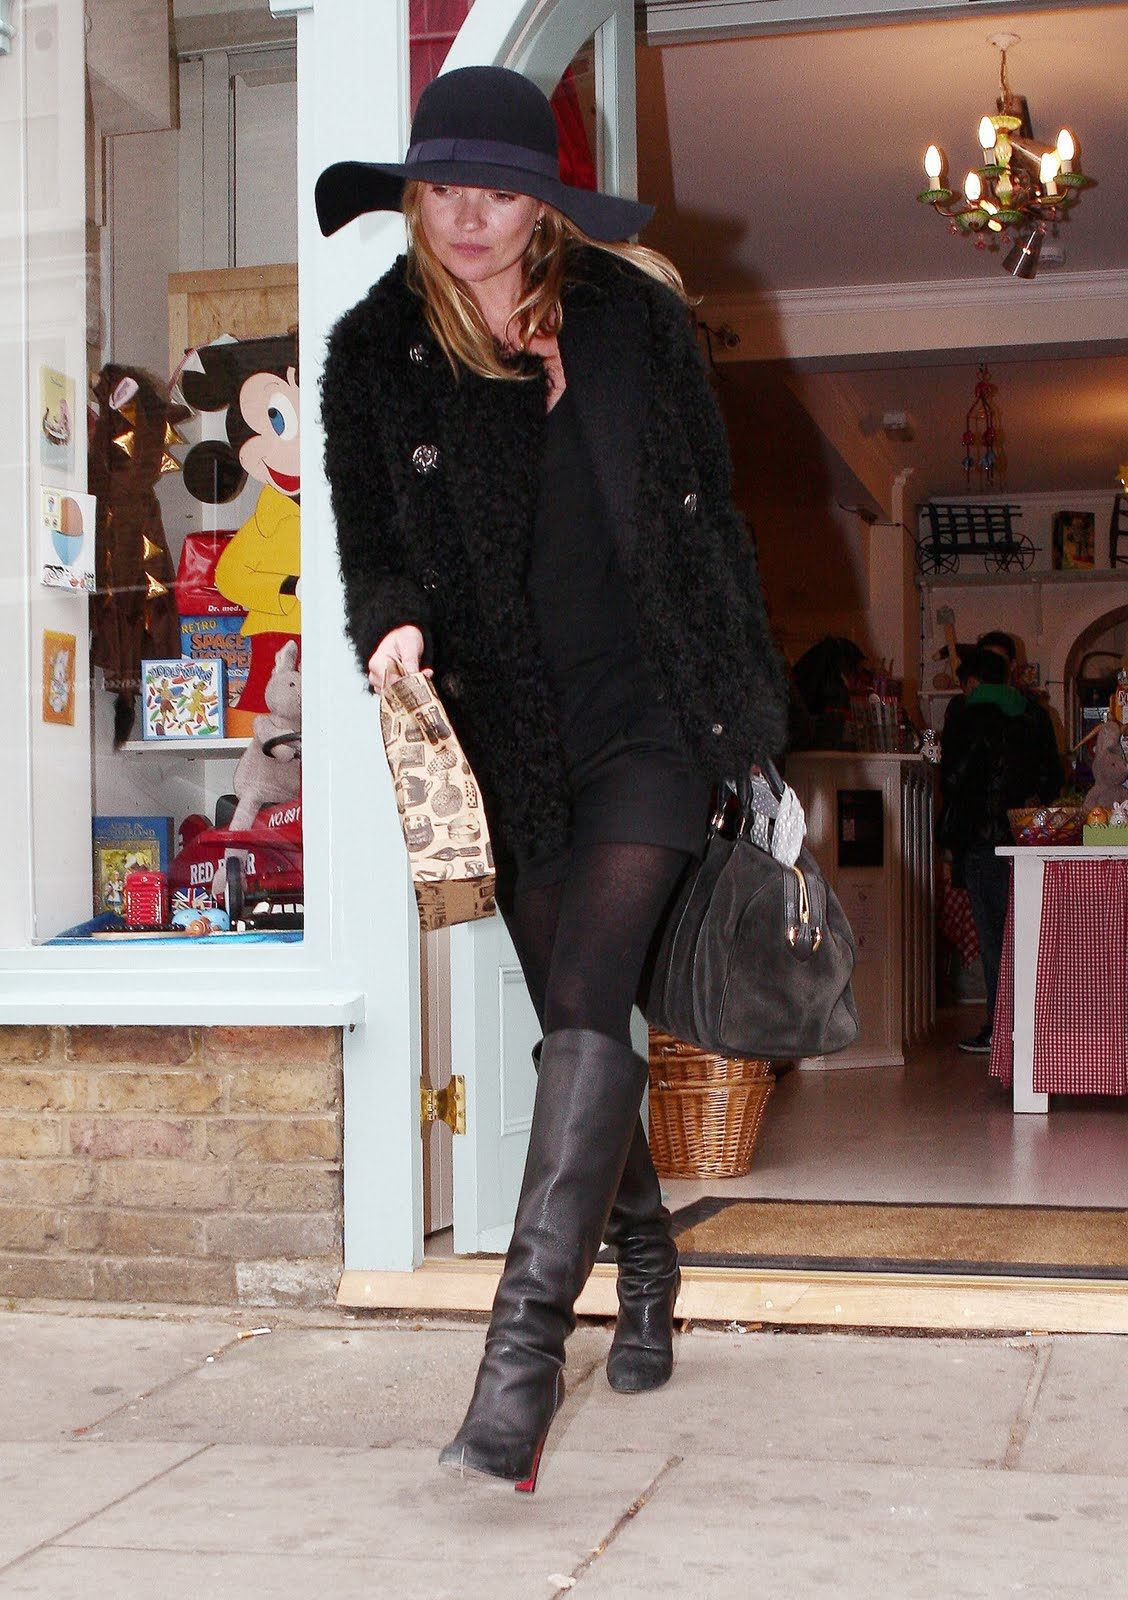 http://2.bp.blogspot.com/-4Wiqv1a0gU8/TmUcIIP-GnI/AAAAAAAAAPA/5P5Bd-LjF-s/s1600/outfits_kate_moss.jpg